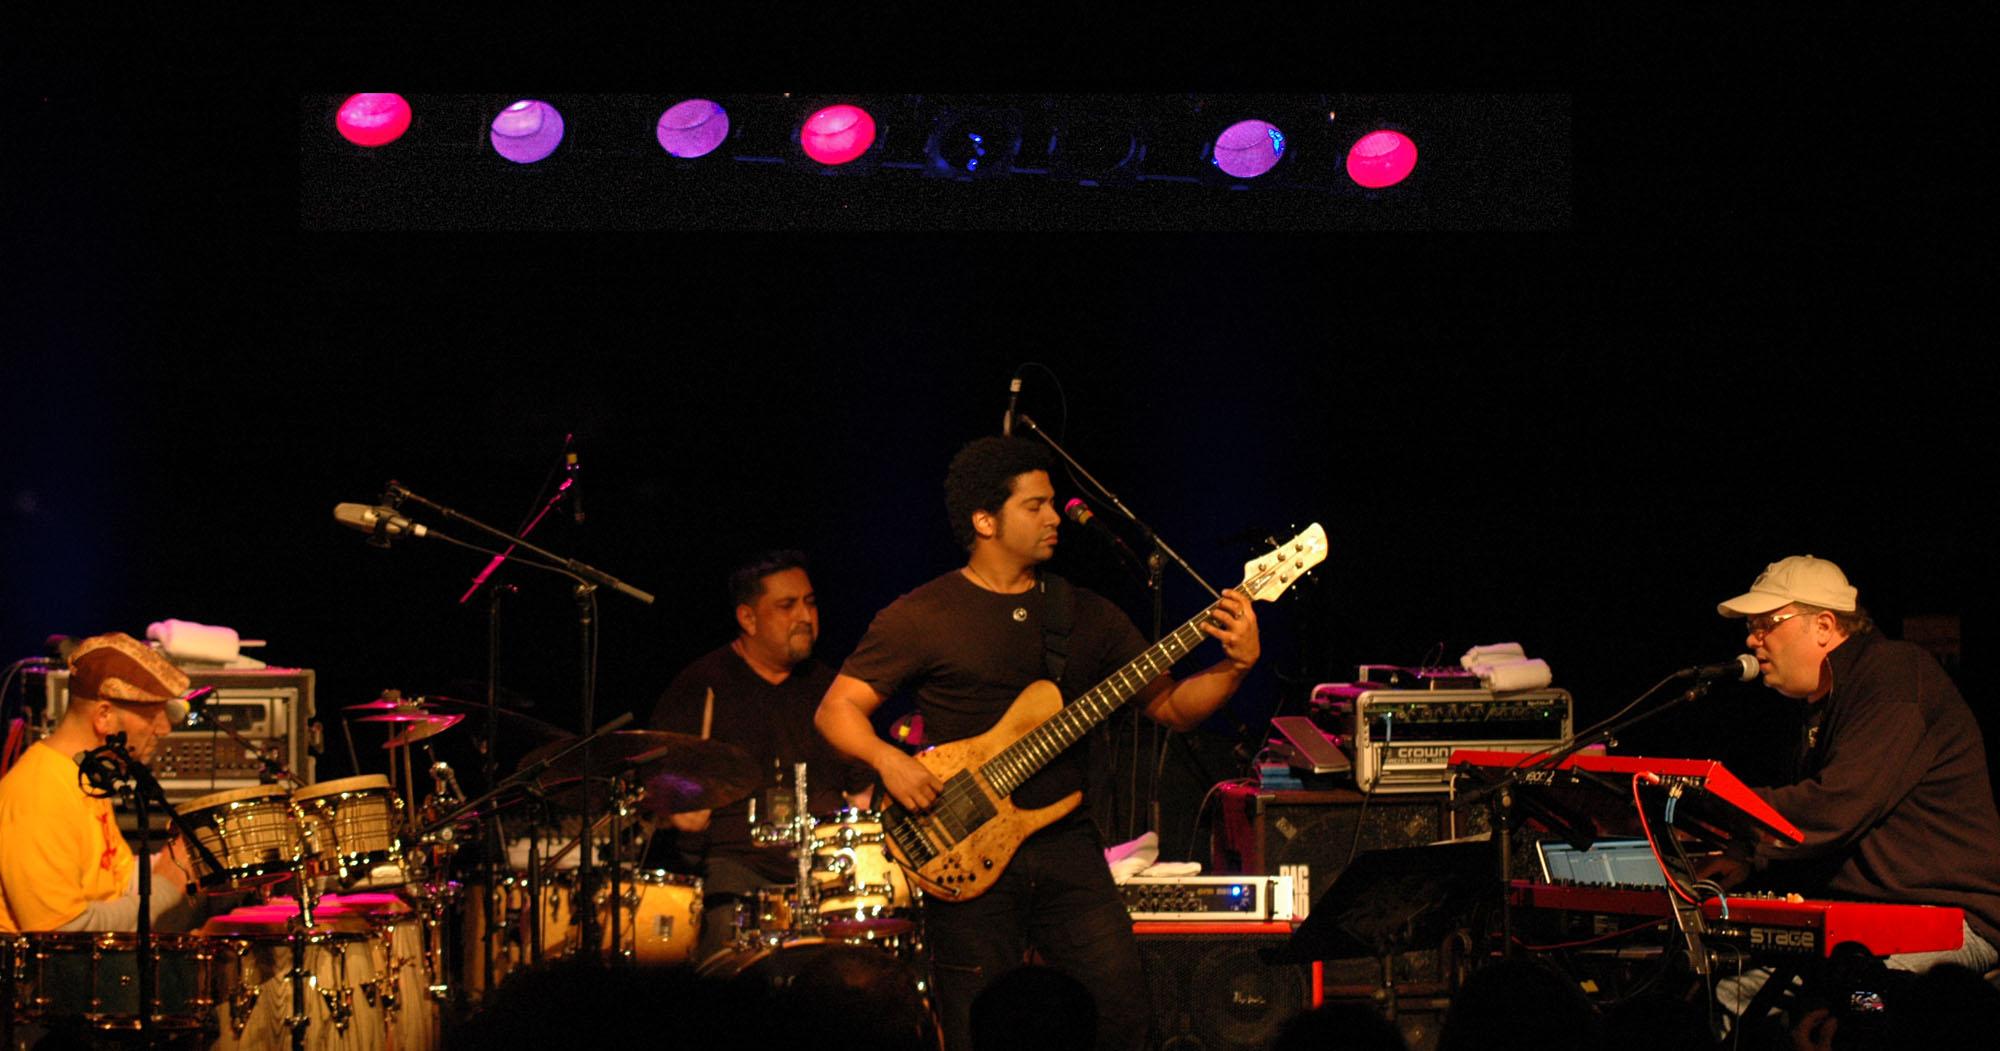 Arto Tuncboyaciyan, Ranit Barot, Matthew Garrison and Scott Kinsey, Performing with Human Element at the New Universe Music Festival 2010